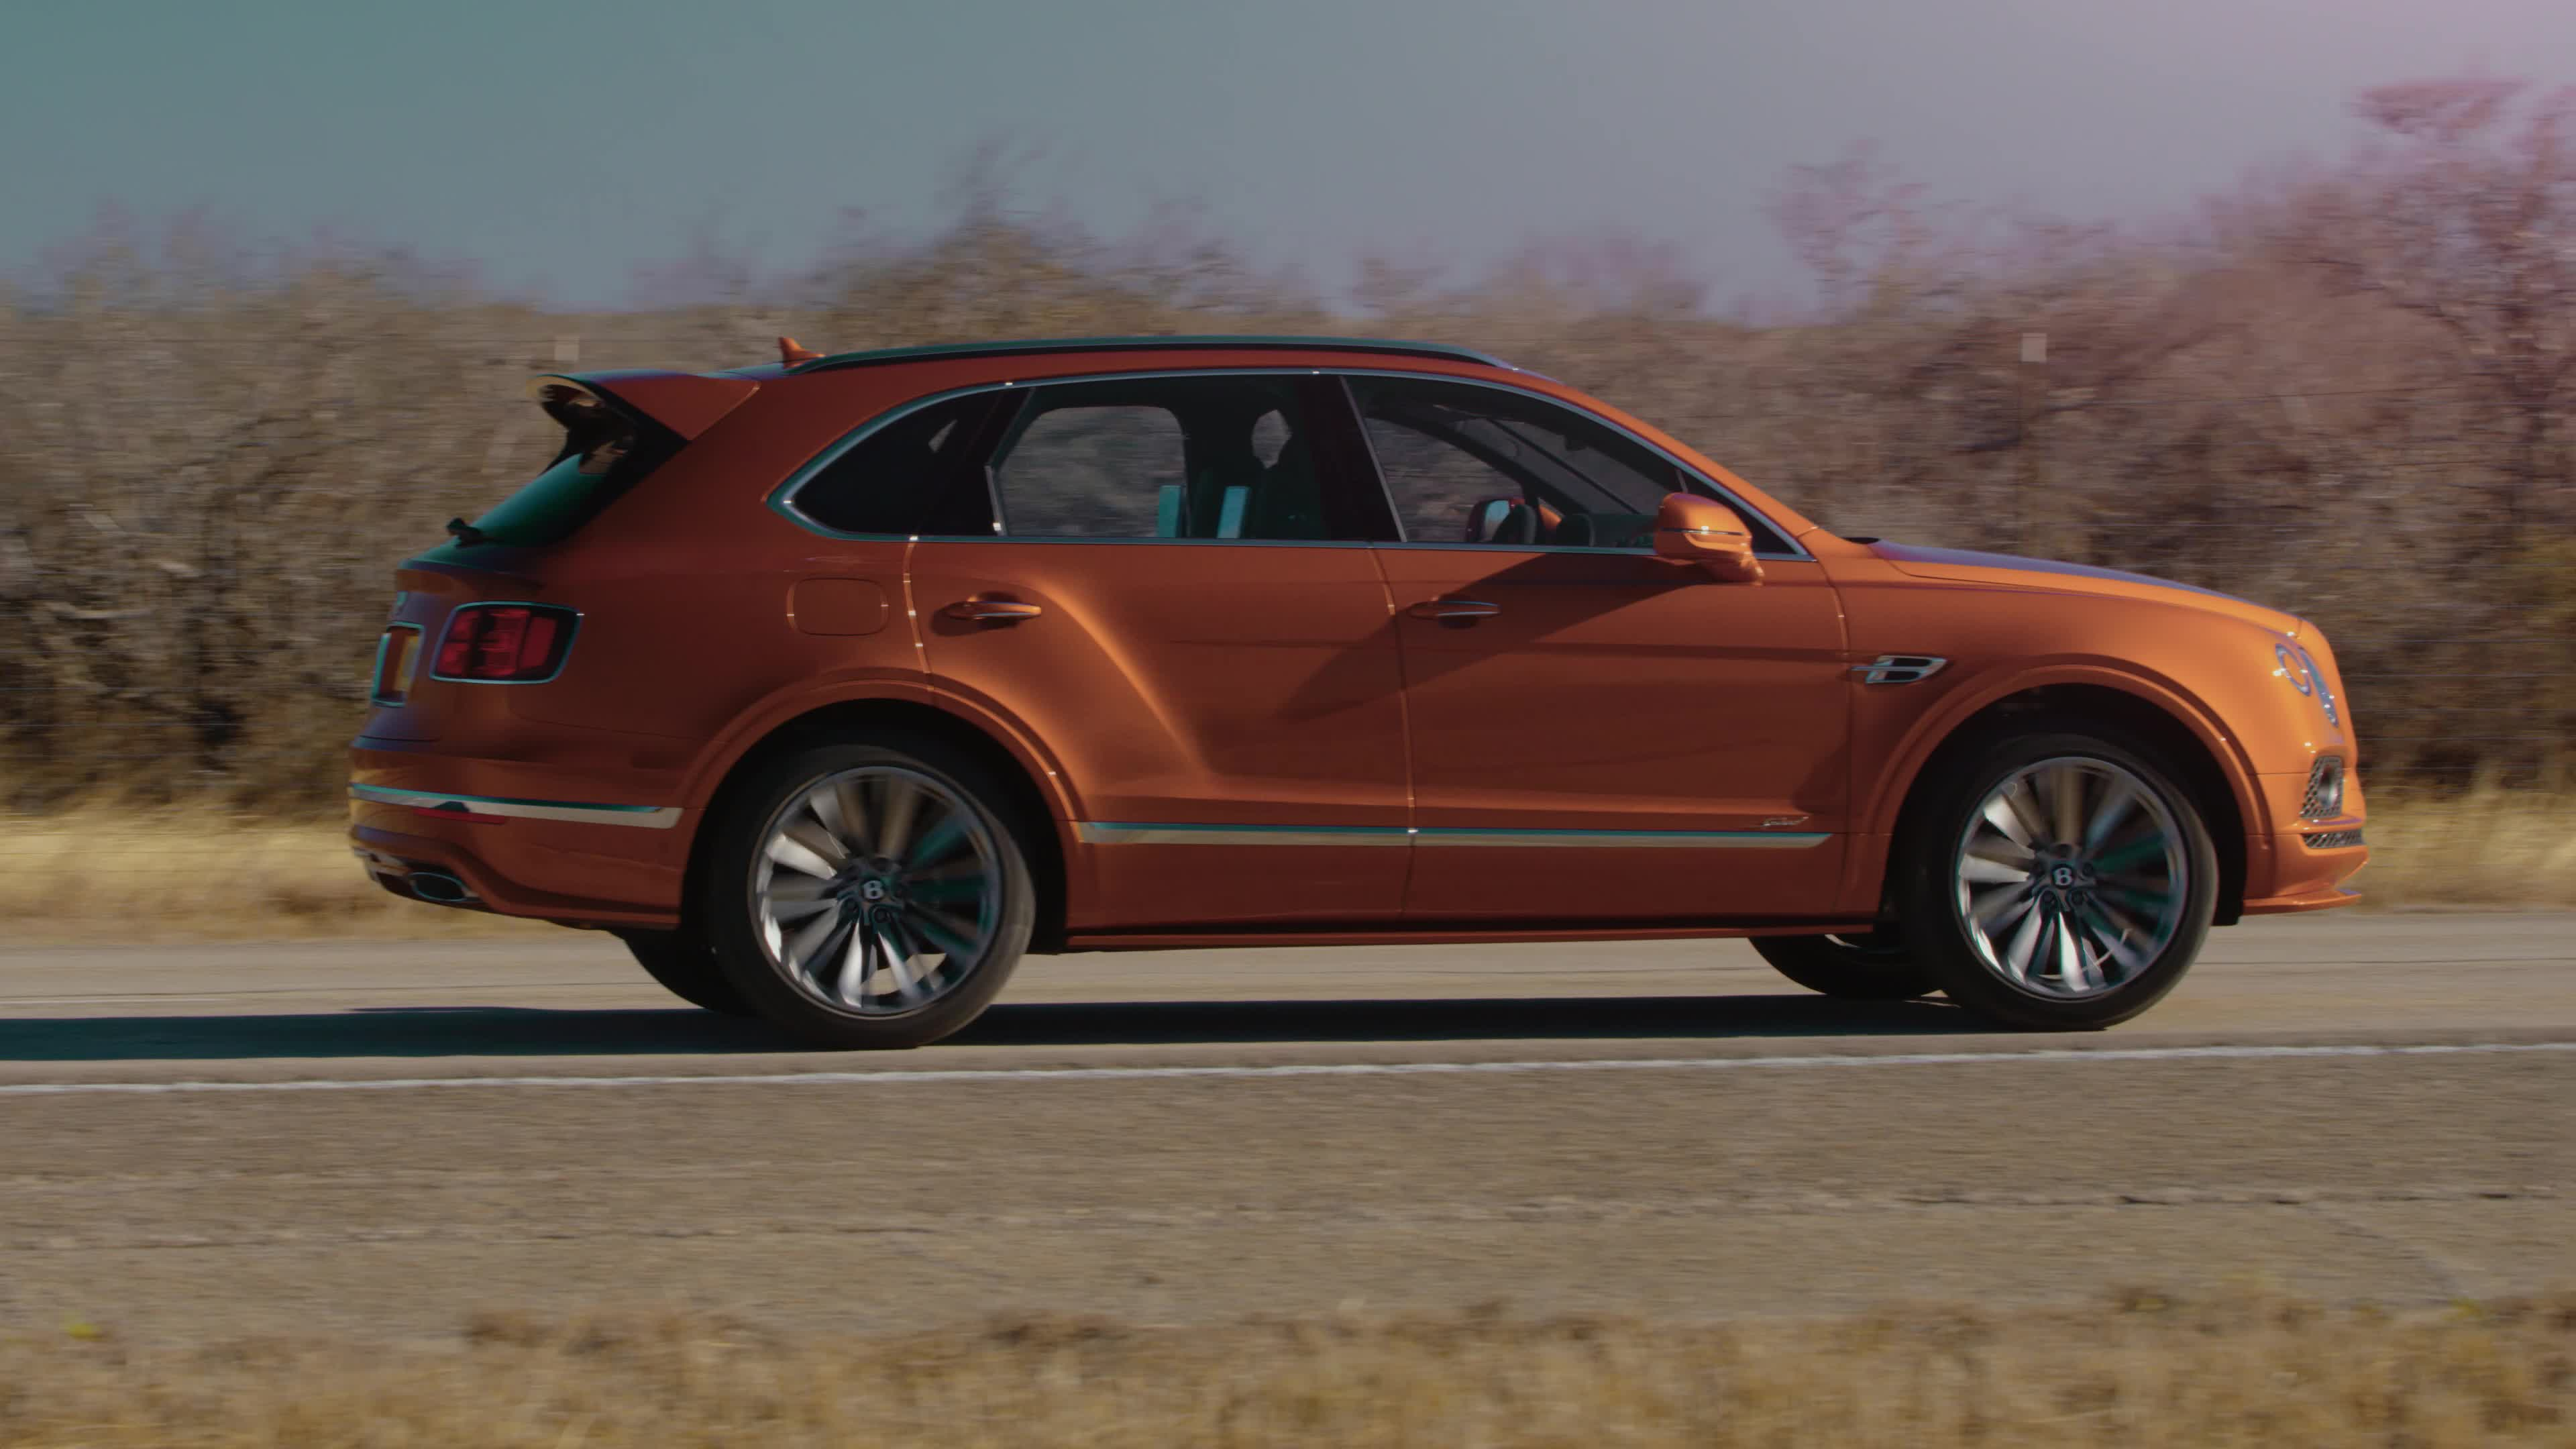 2020 Bentley Bentayga More Powerful Than Ever >> 2020 Bentley Bentayga Speed Is A 190 Mph Suv Autoblog